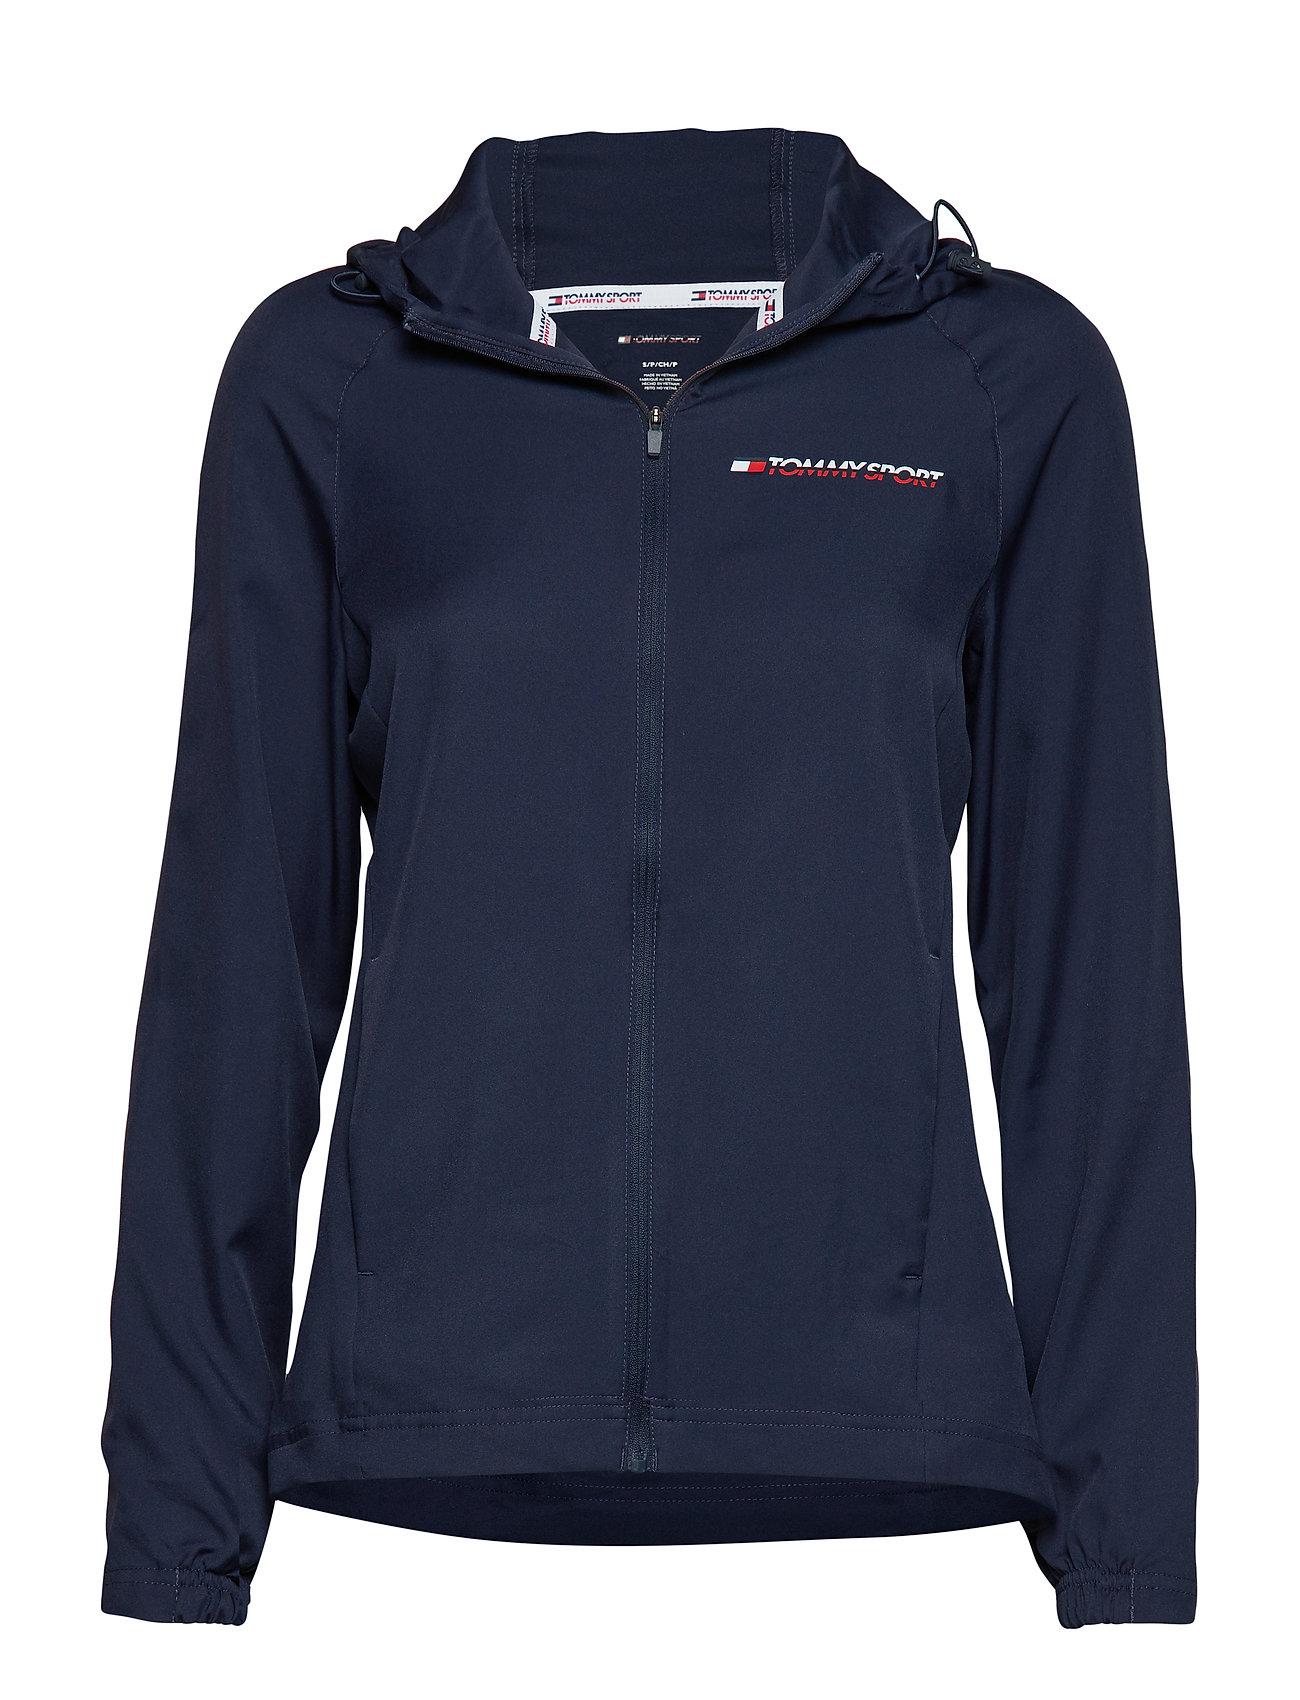 Image of Woven Jacket Sweatshirts & Hoodies Light/Summer Jacket Blå TOMMY SPORT (3144751585)